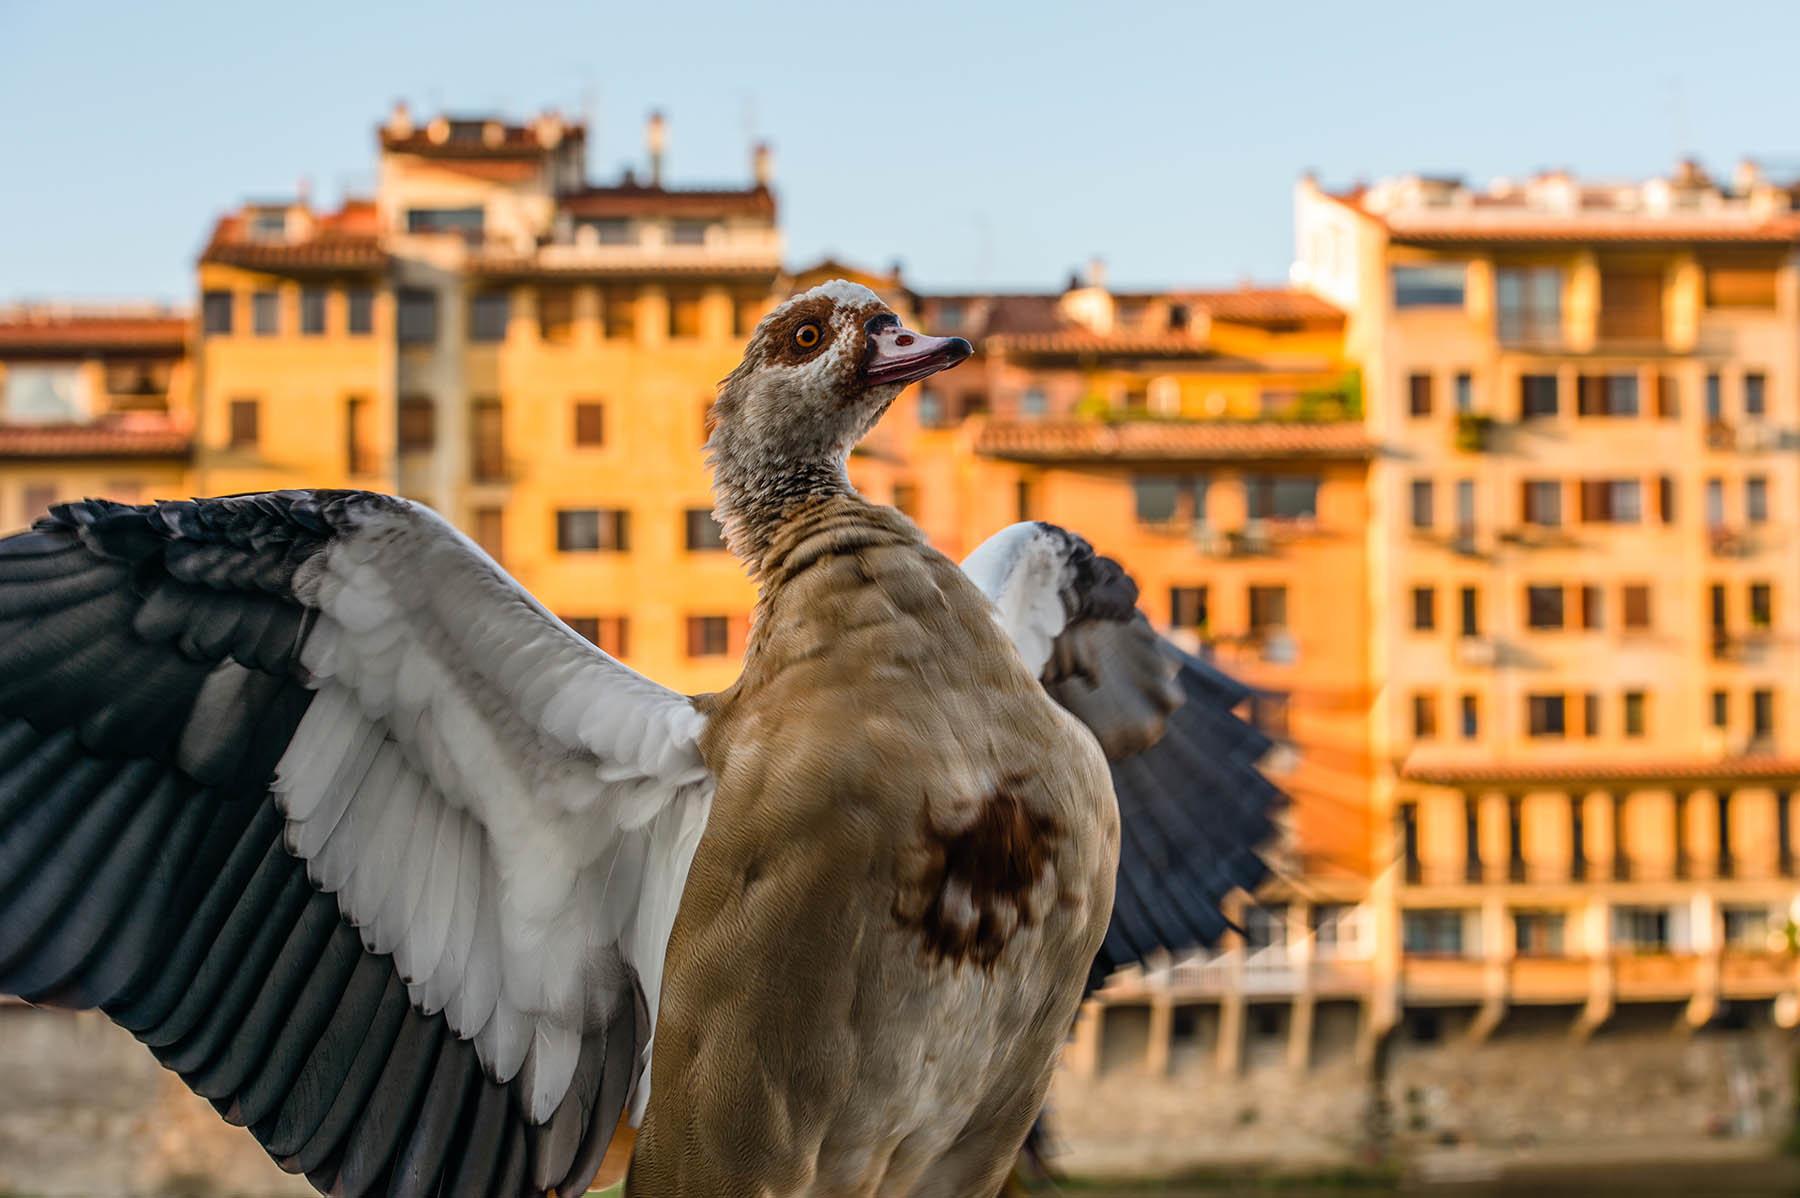 Ptak na Ponte Vecchio we Florencji we WÅ'oszech